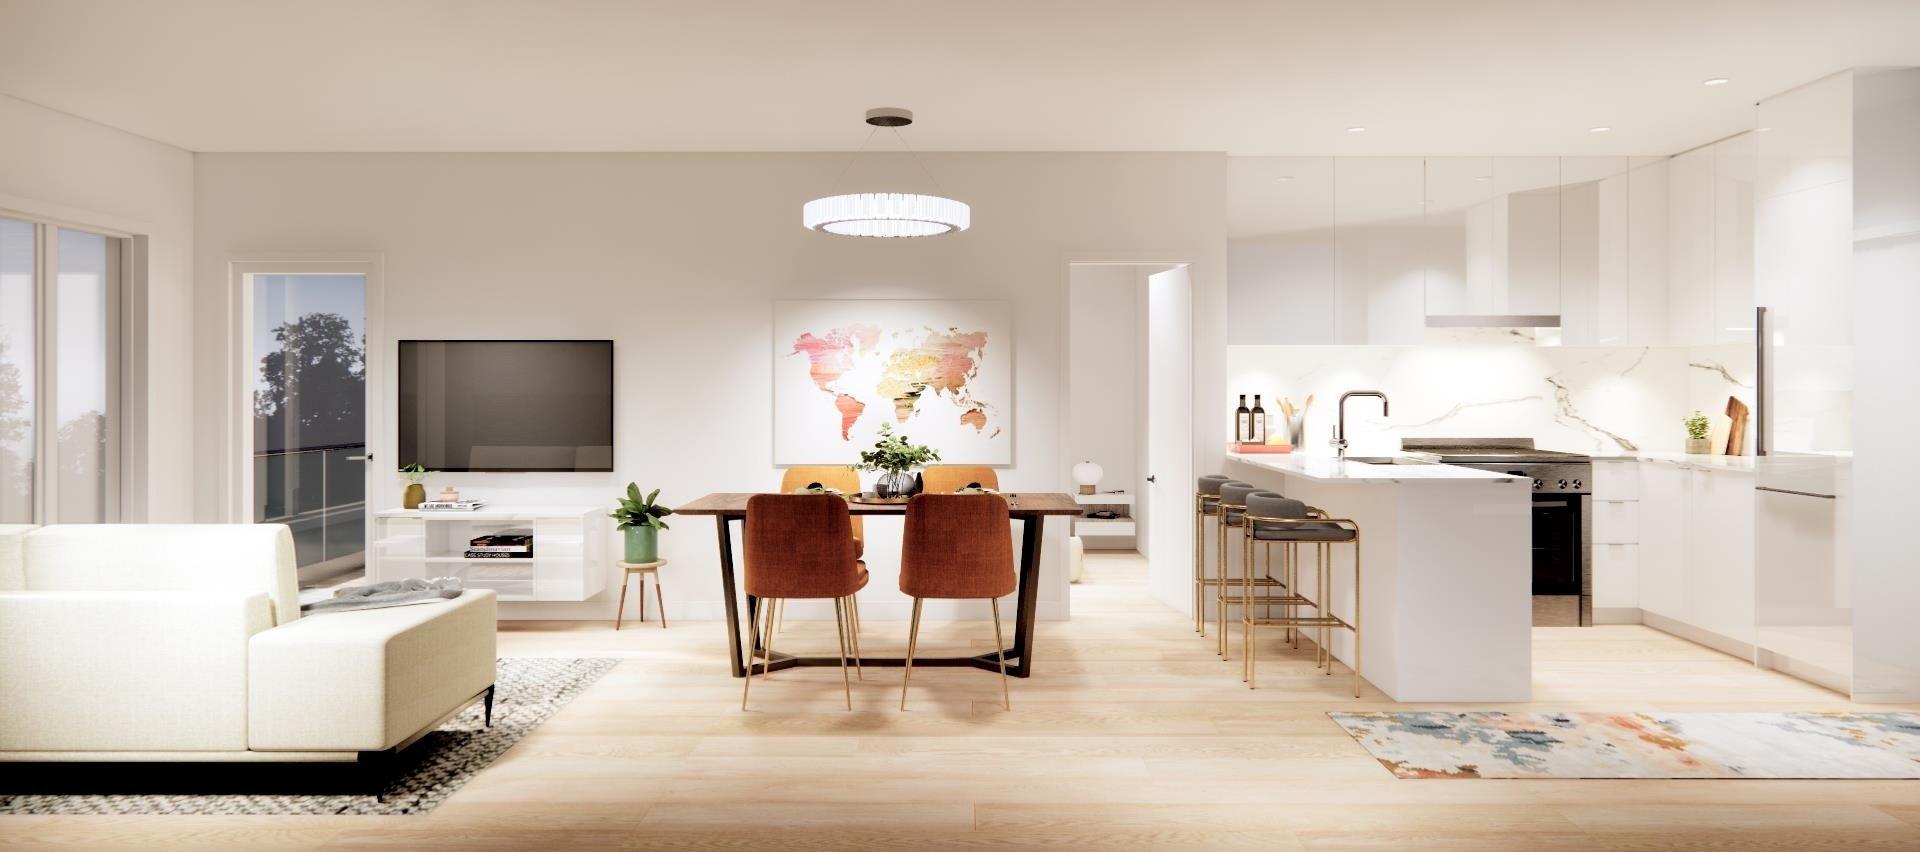 Rendering Of Aura Living Area